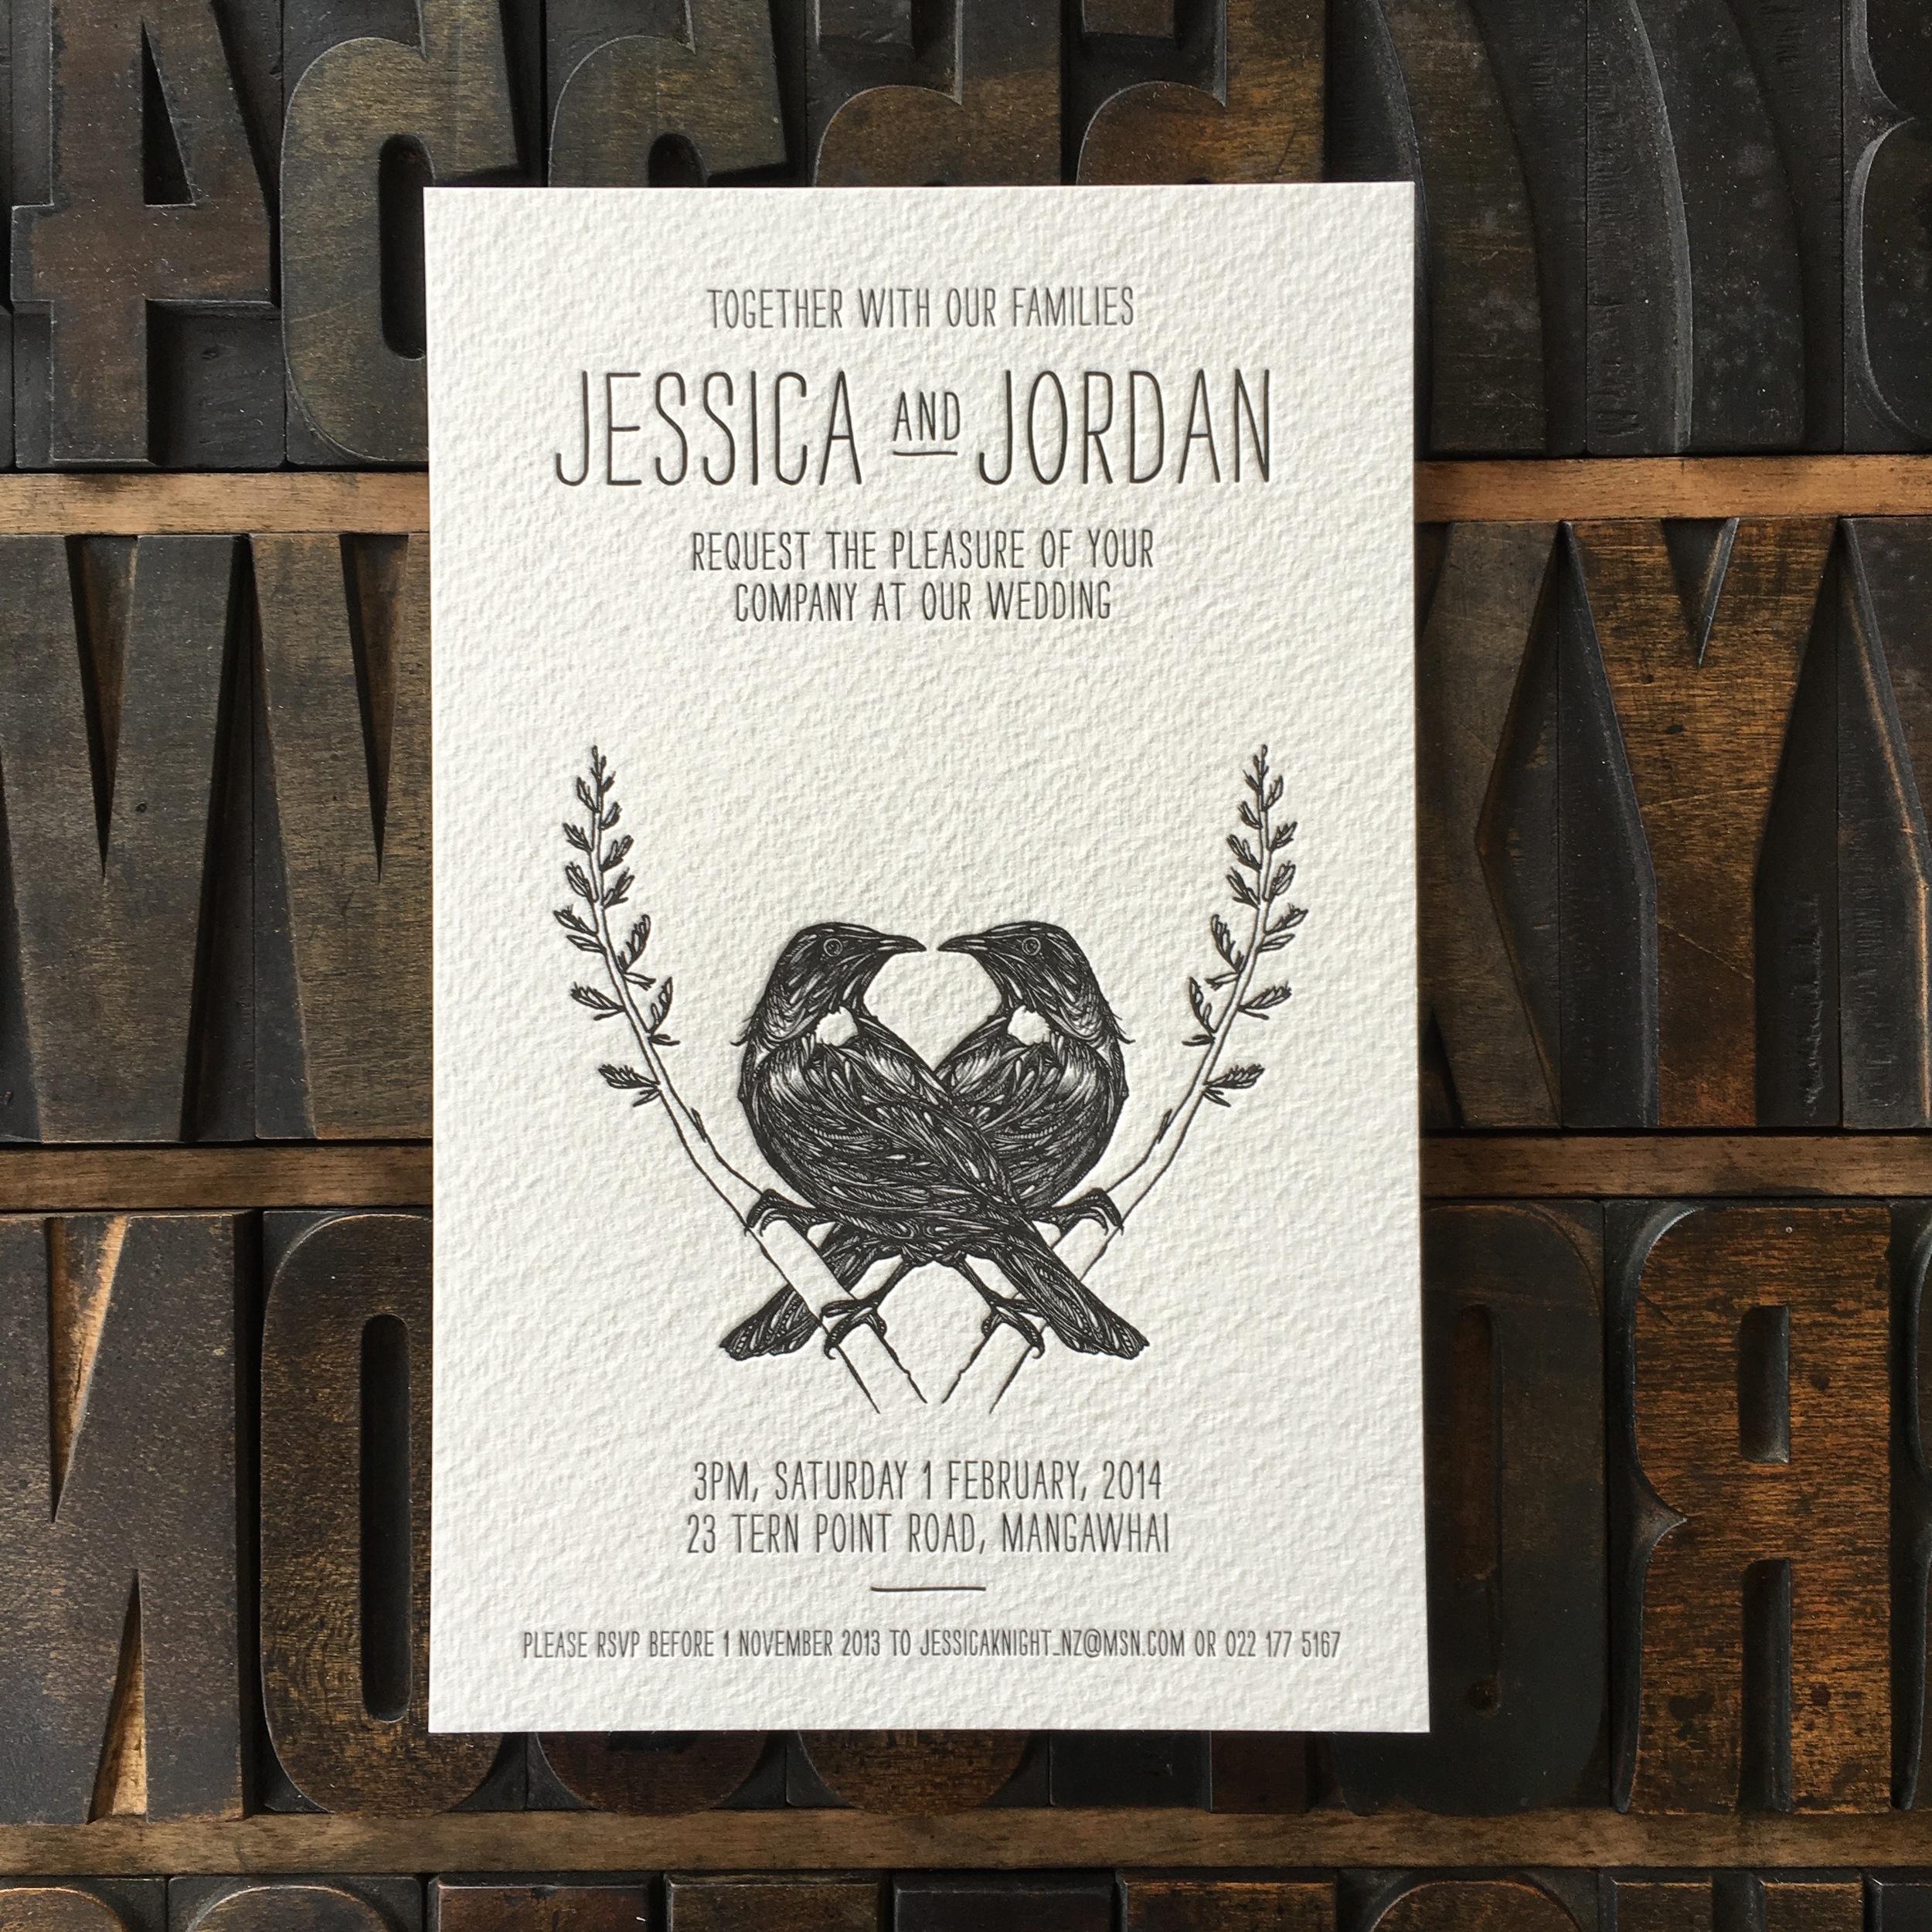 Jessica & Jordan